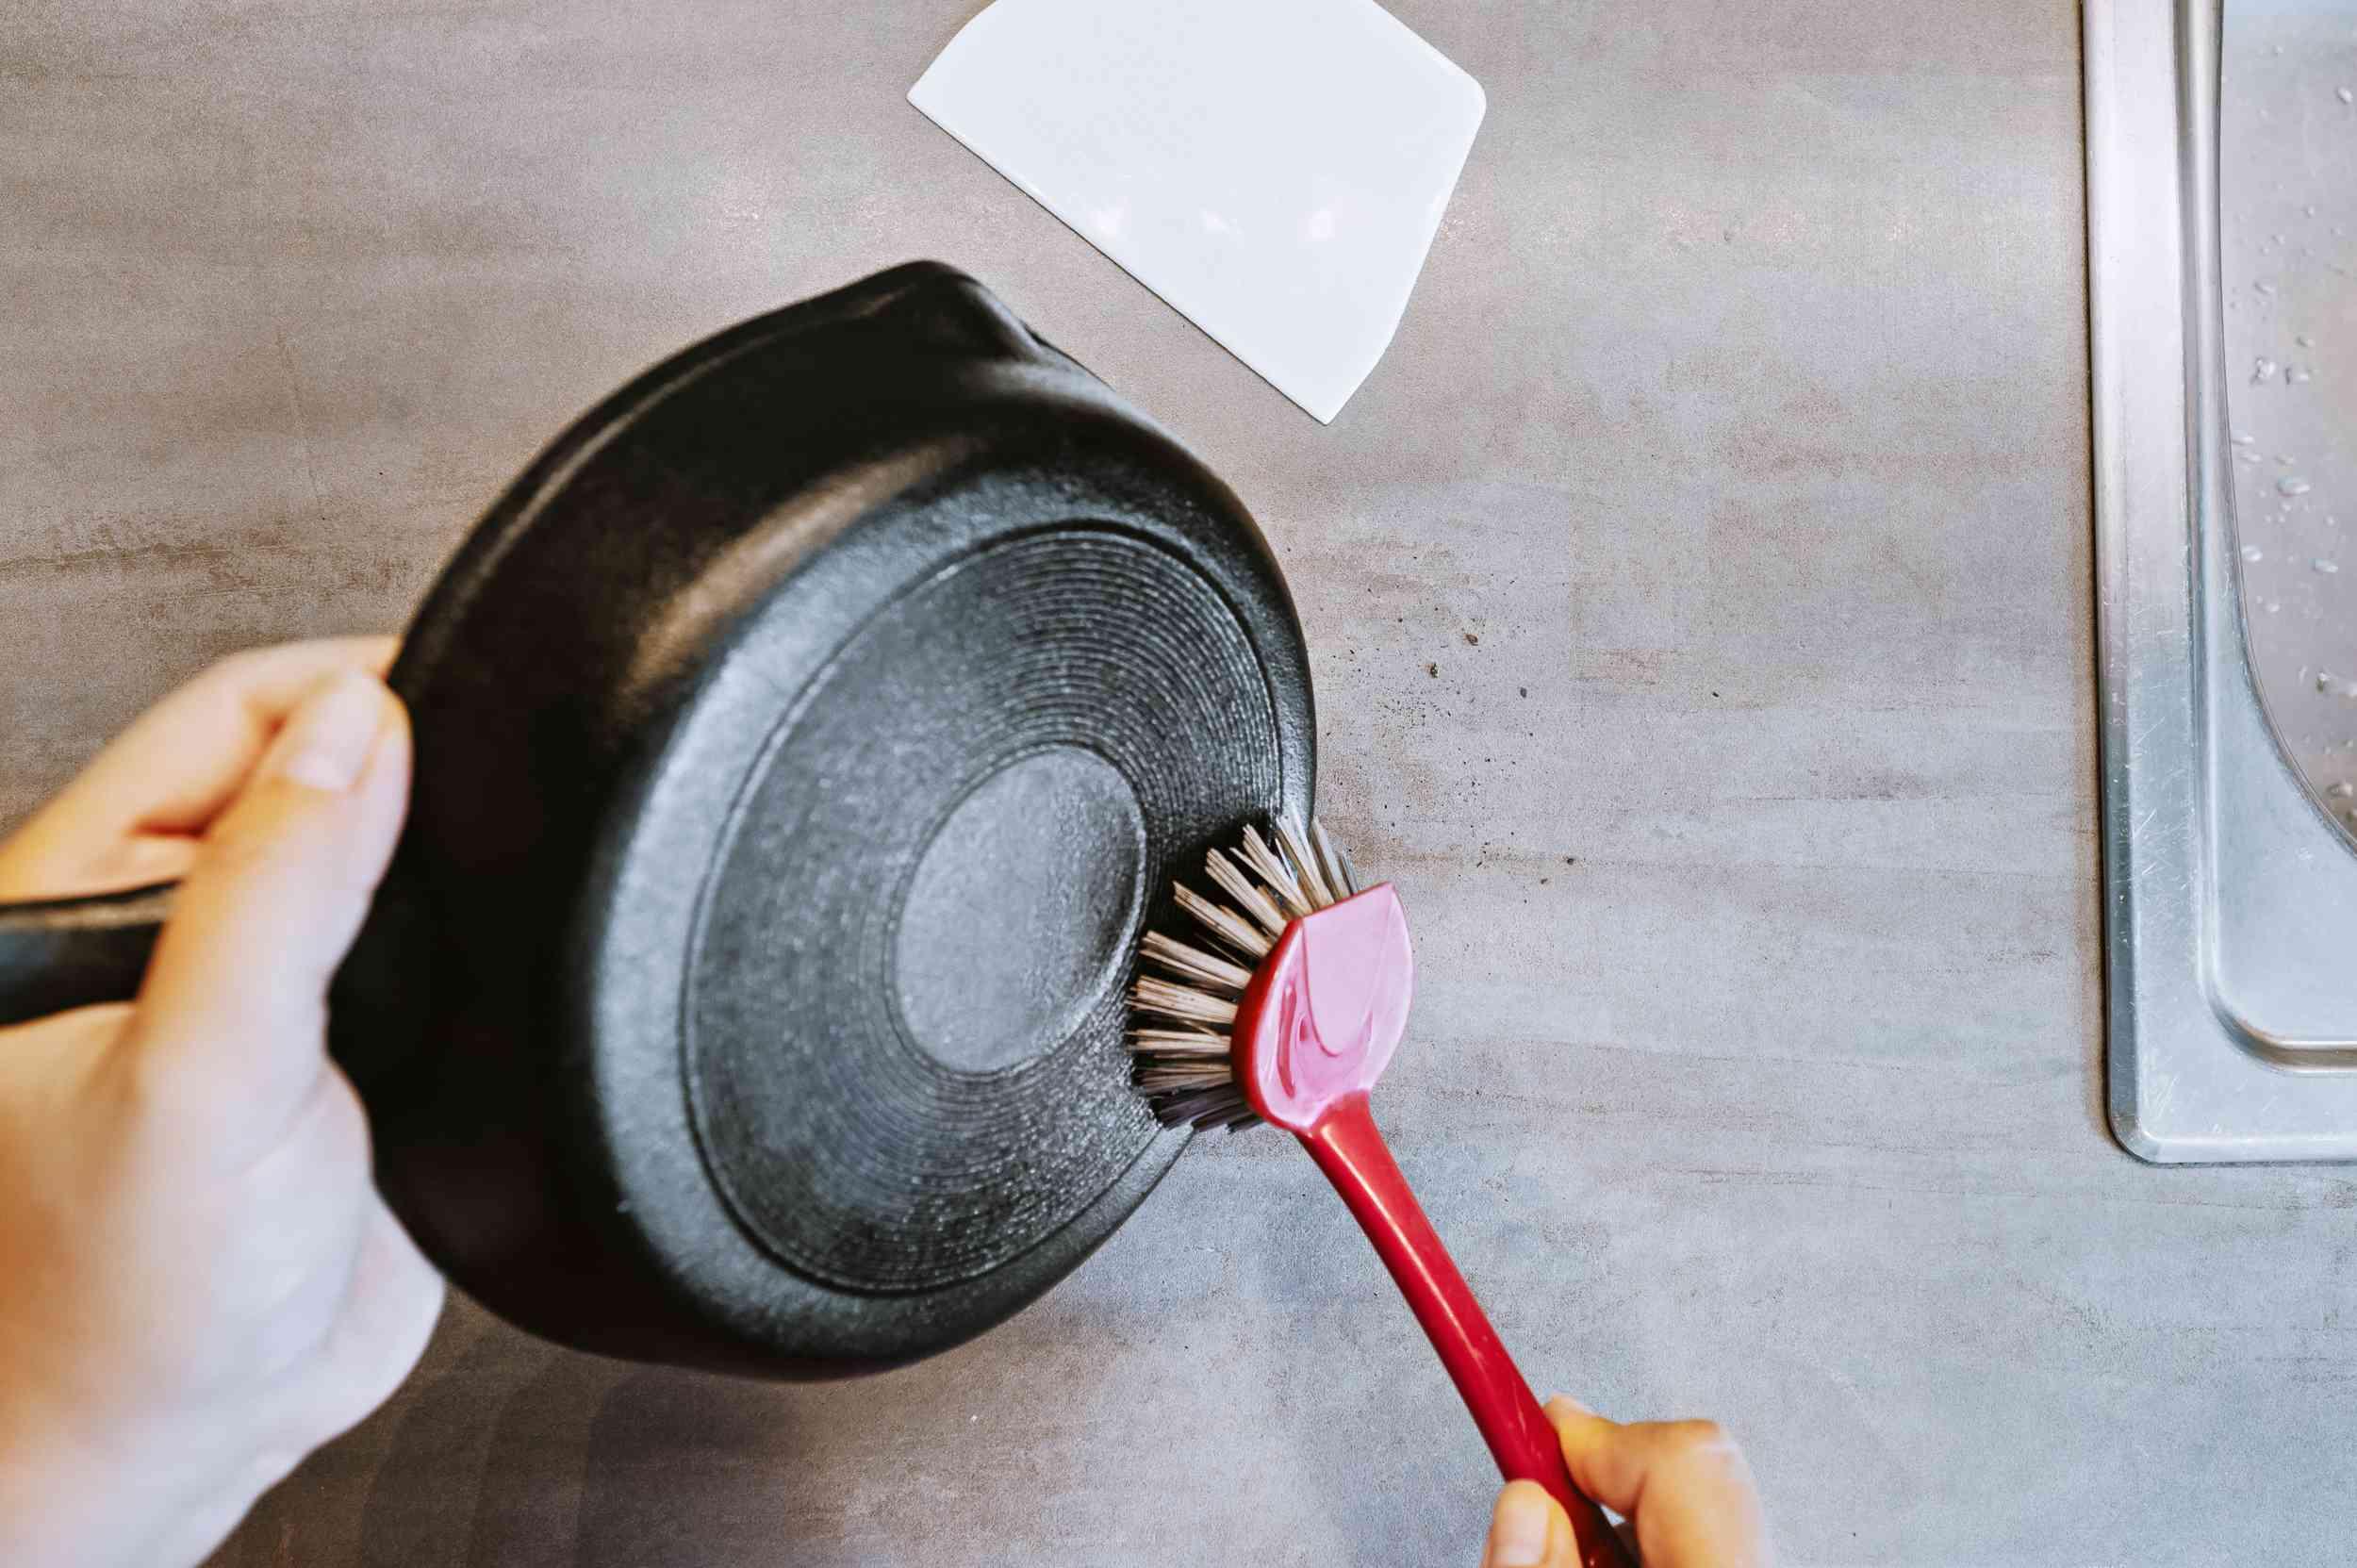 Stiff-bristled nylon brush scraping away rust from bottom of cast iron griddle pan